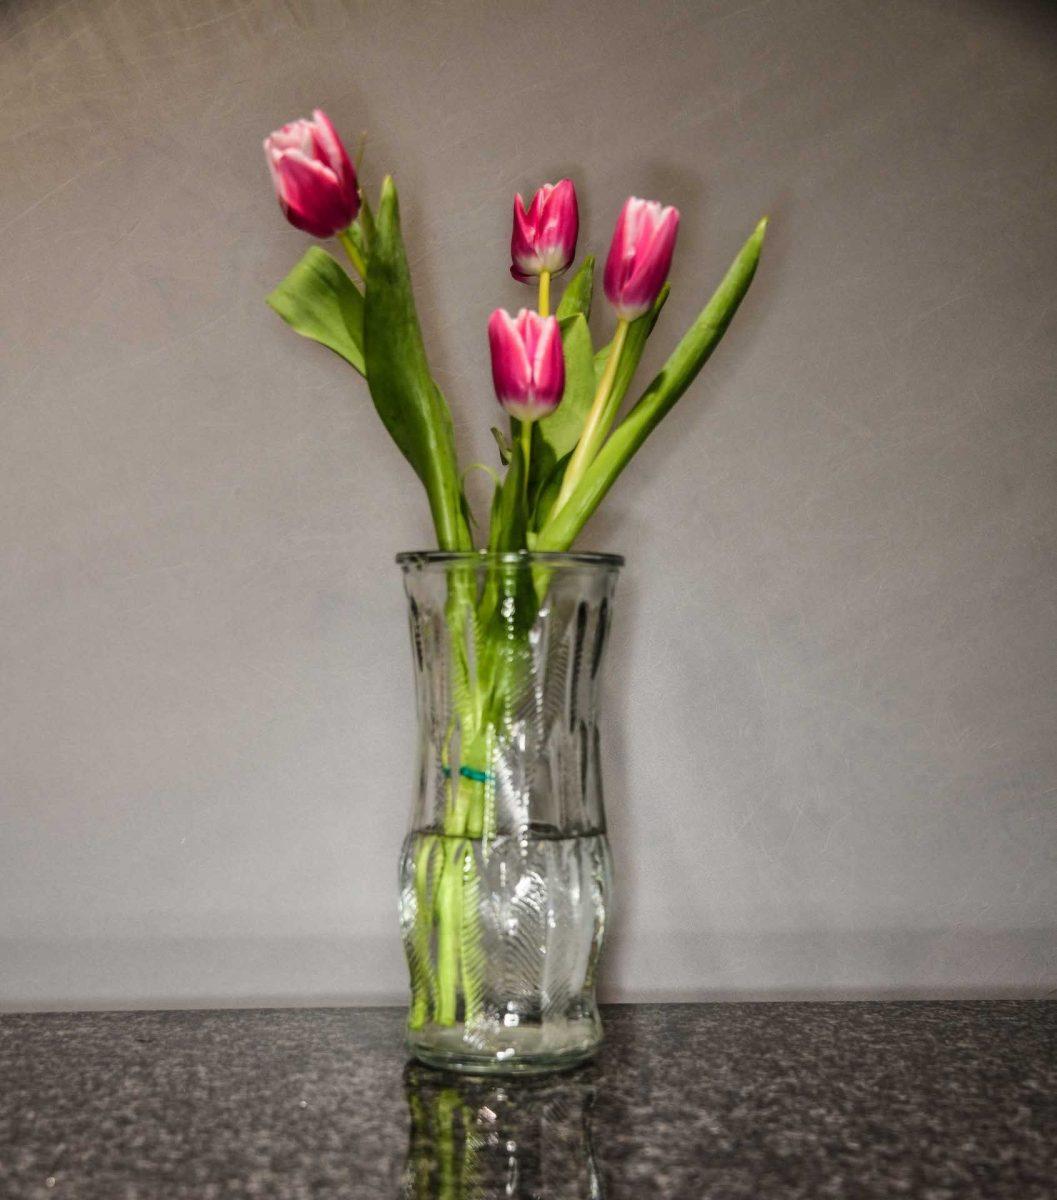 Randy Siegel - Four Tulips